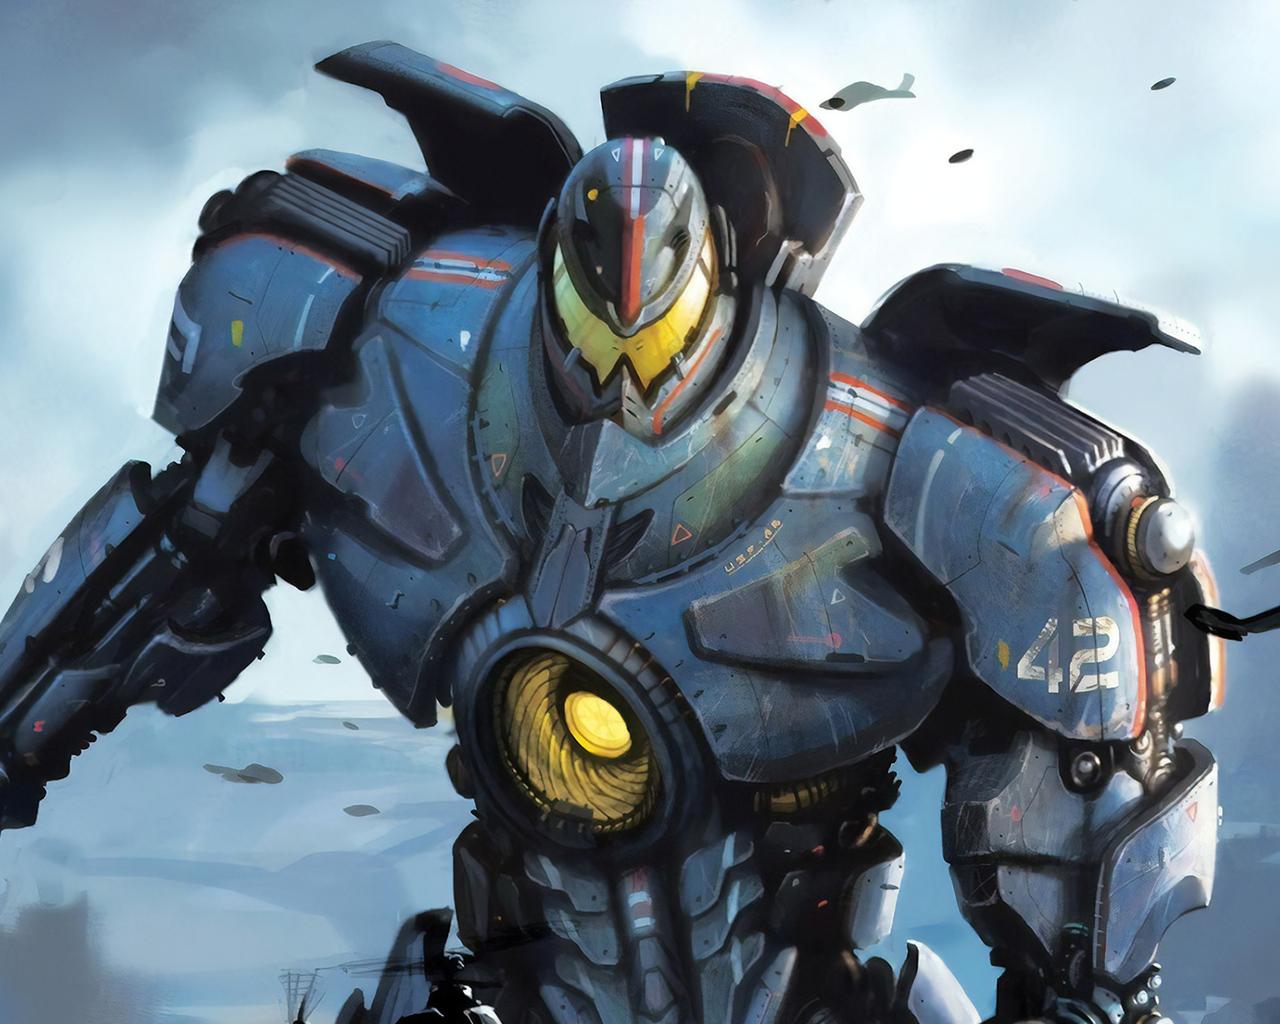 giant-robot-pacific-rim-g7.jpg